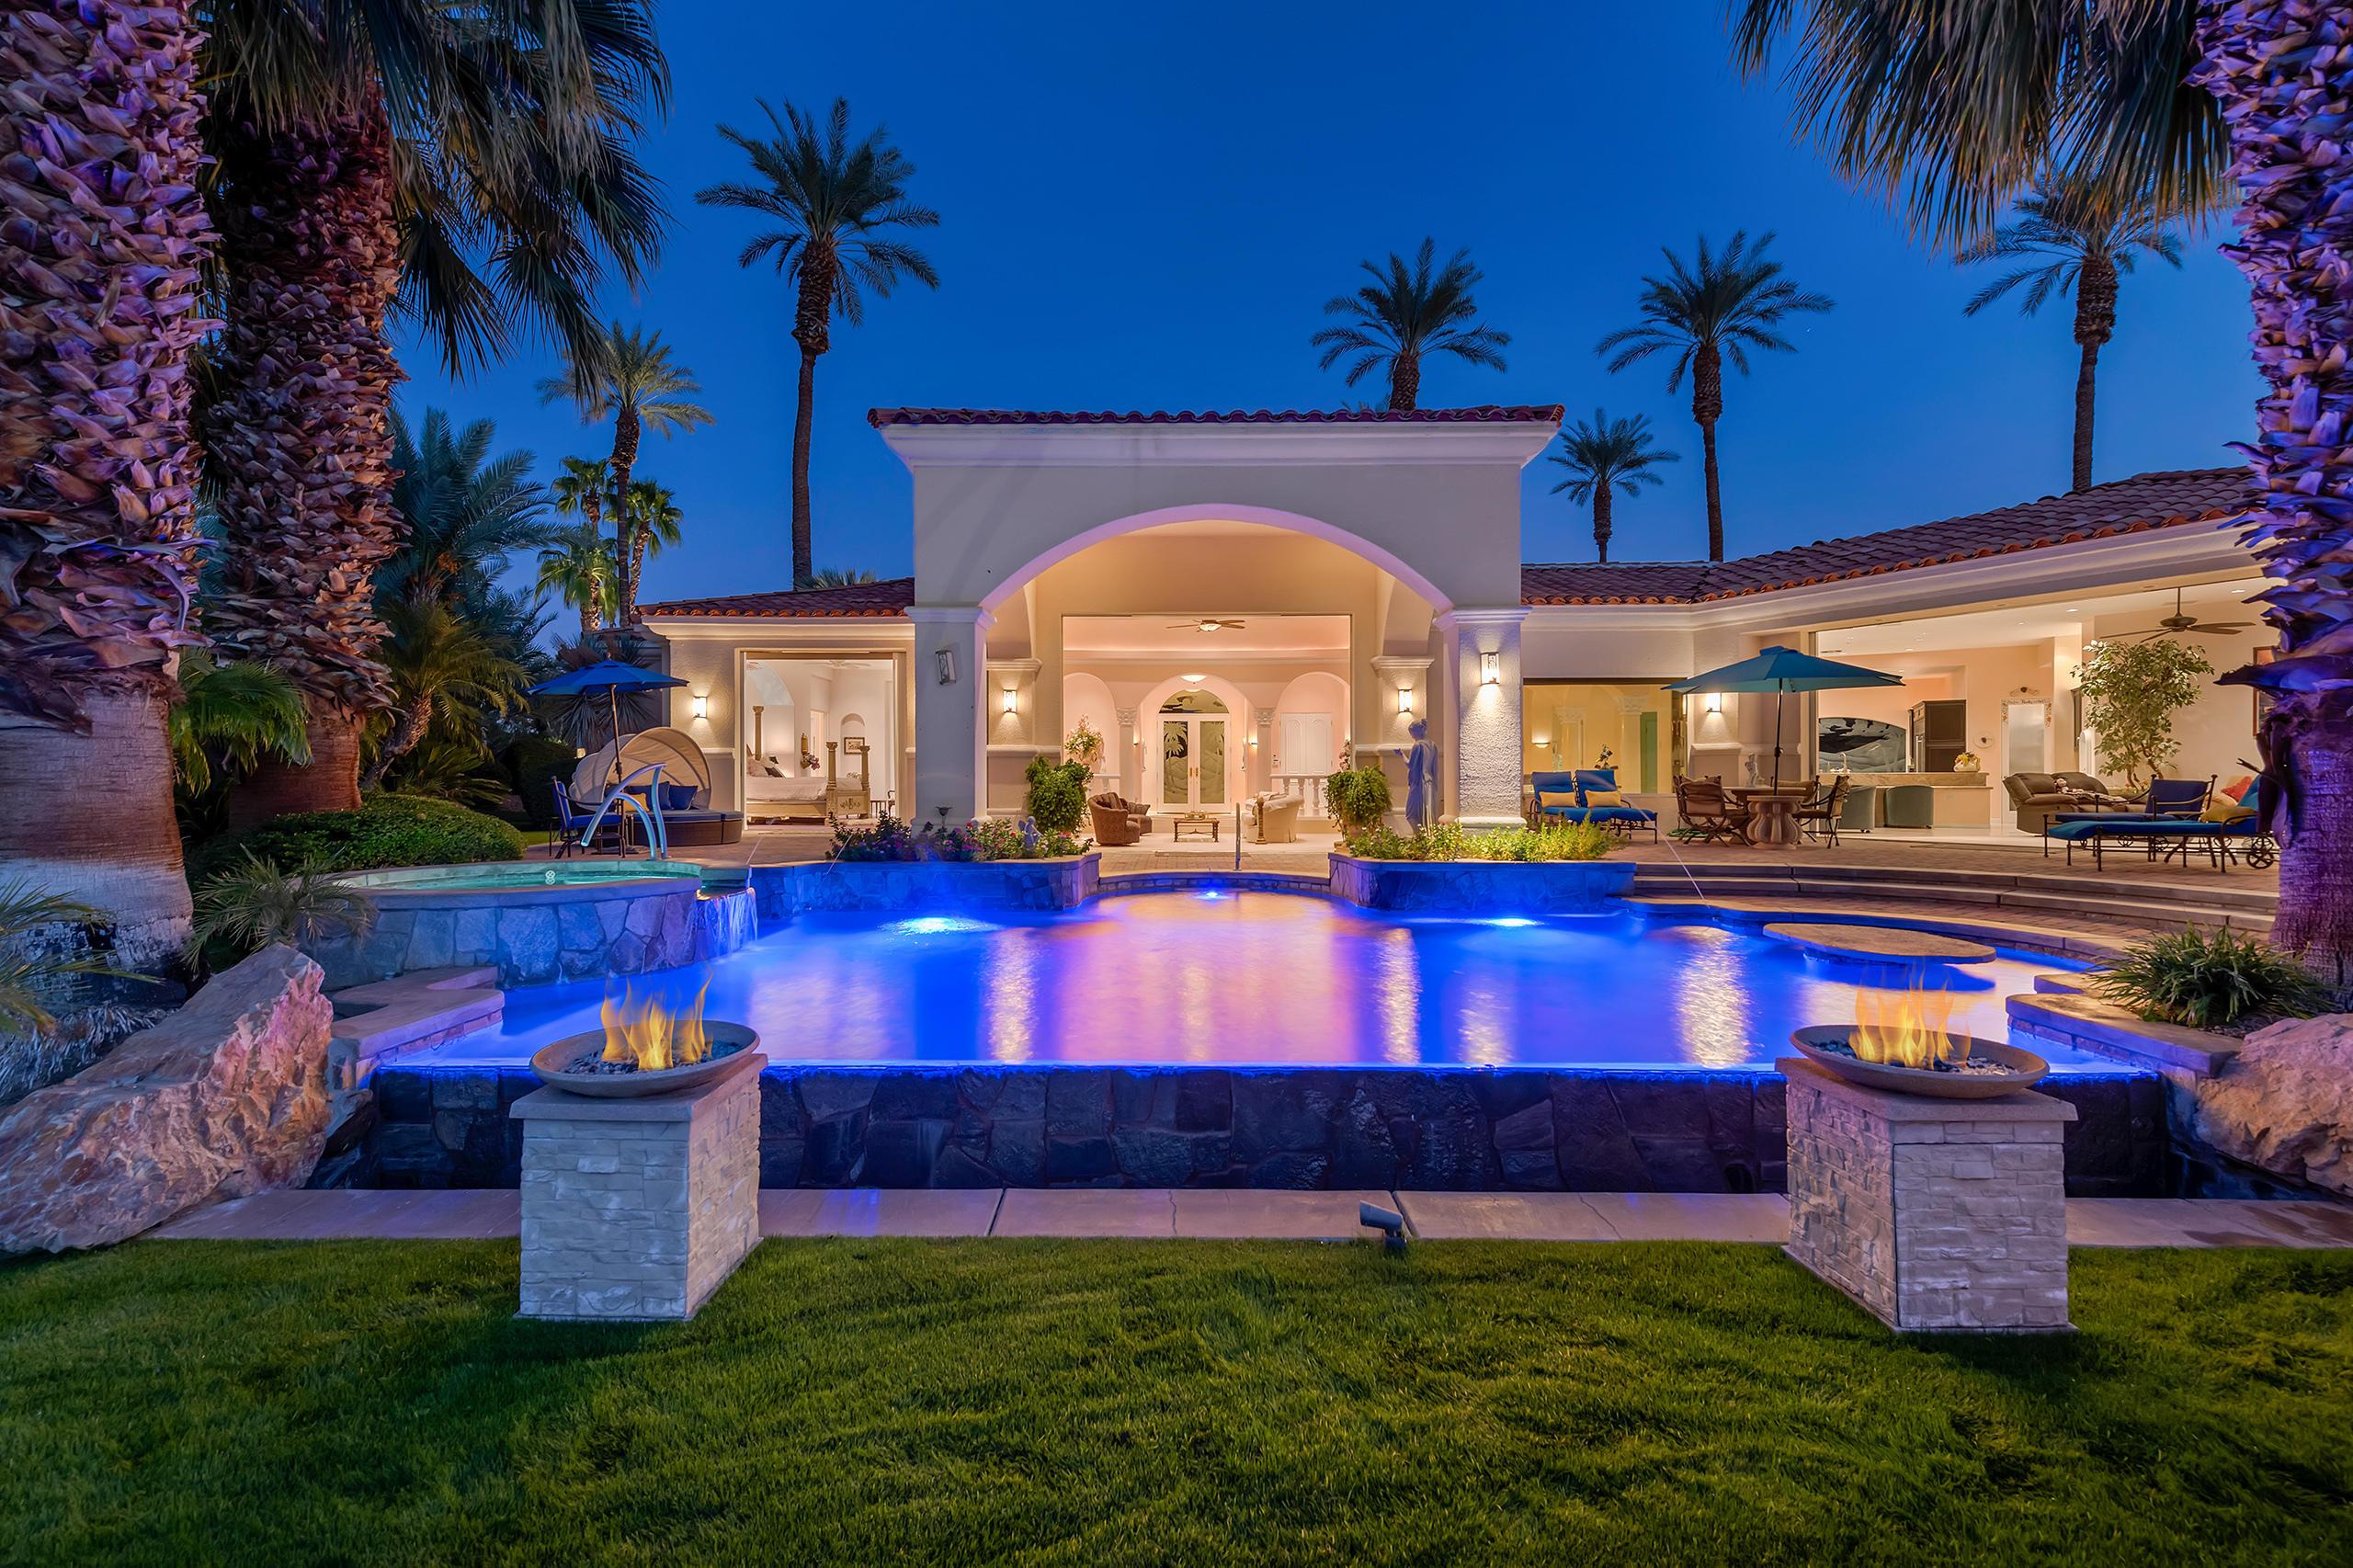 Photo of 140 Waterford Circle, Rancho Mirage, CA 92270